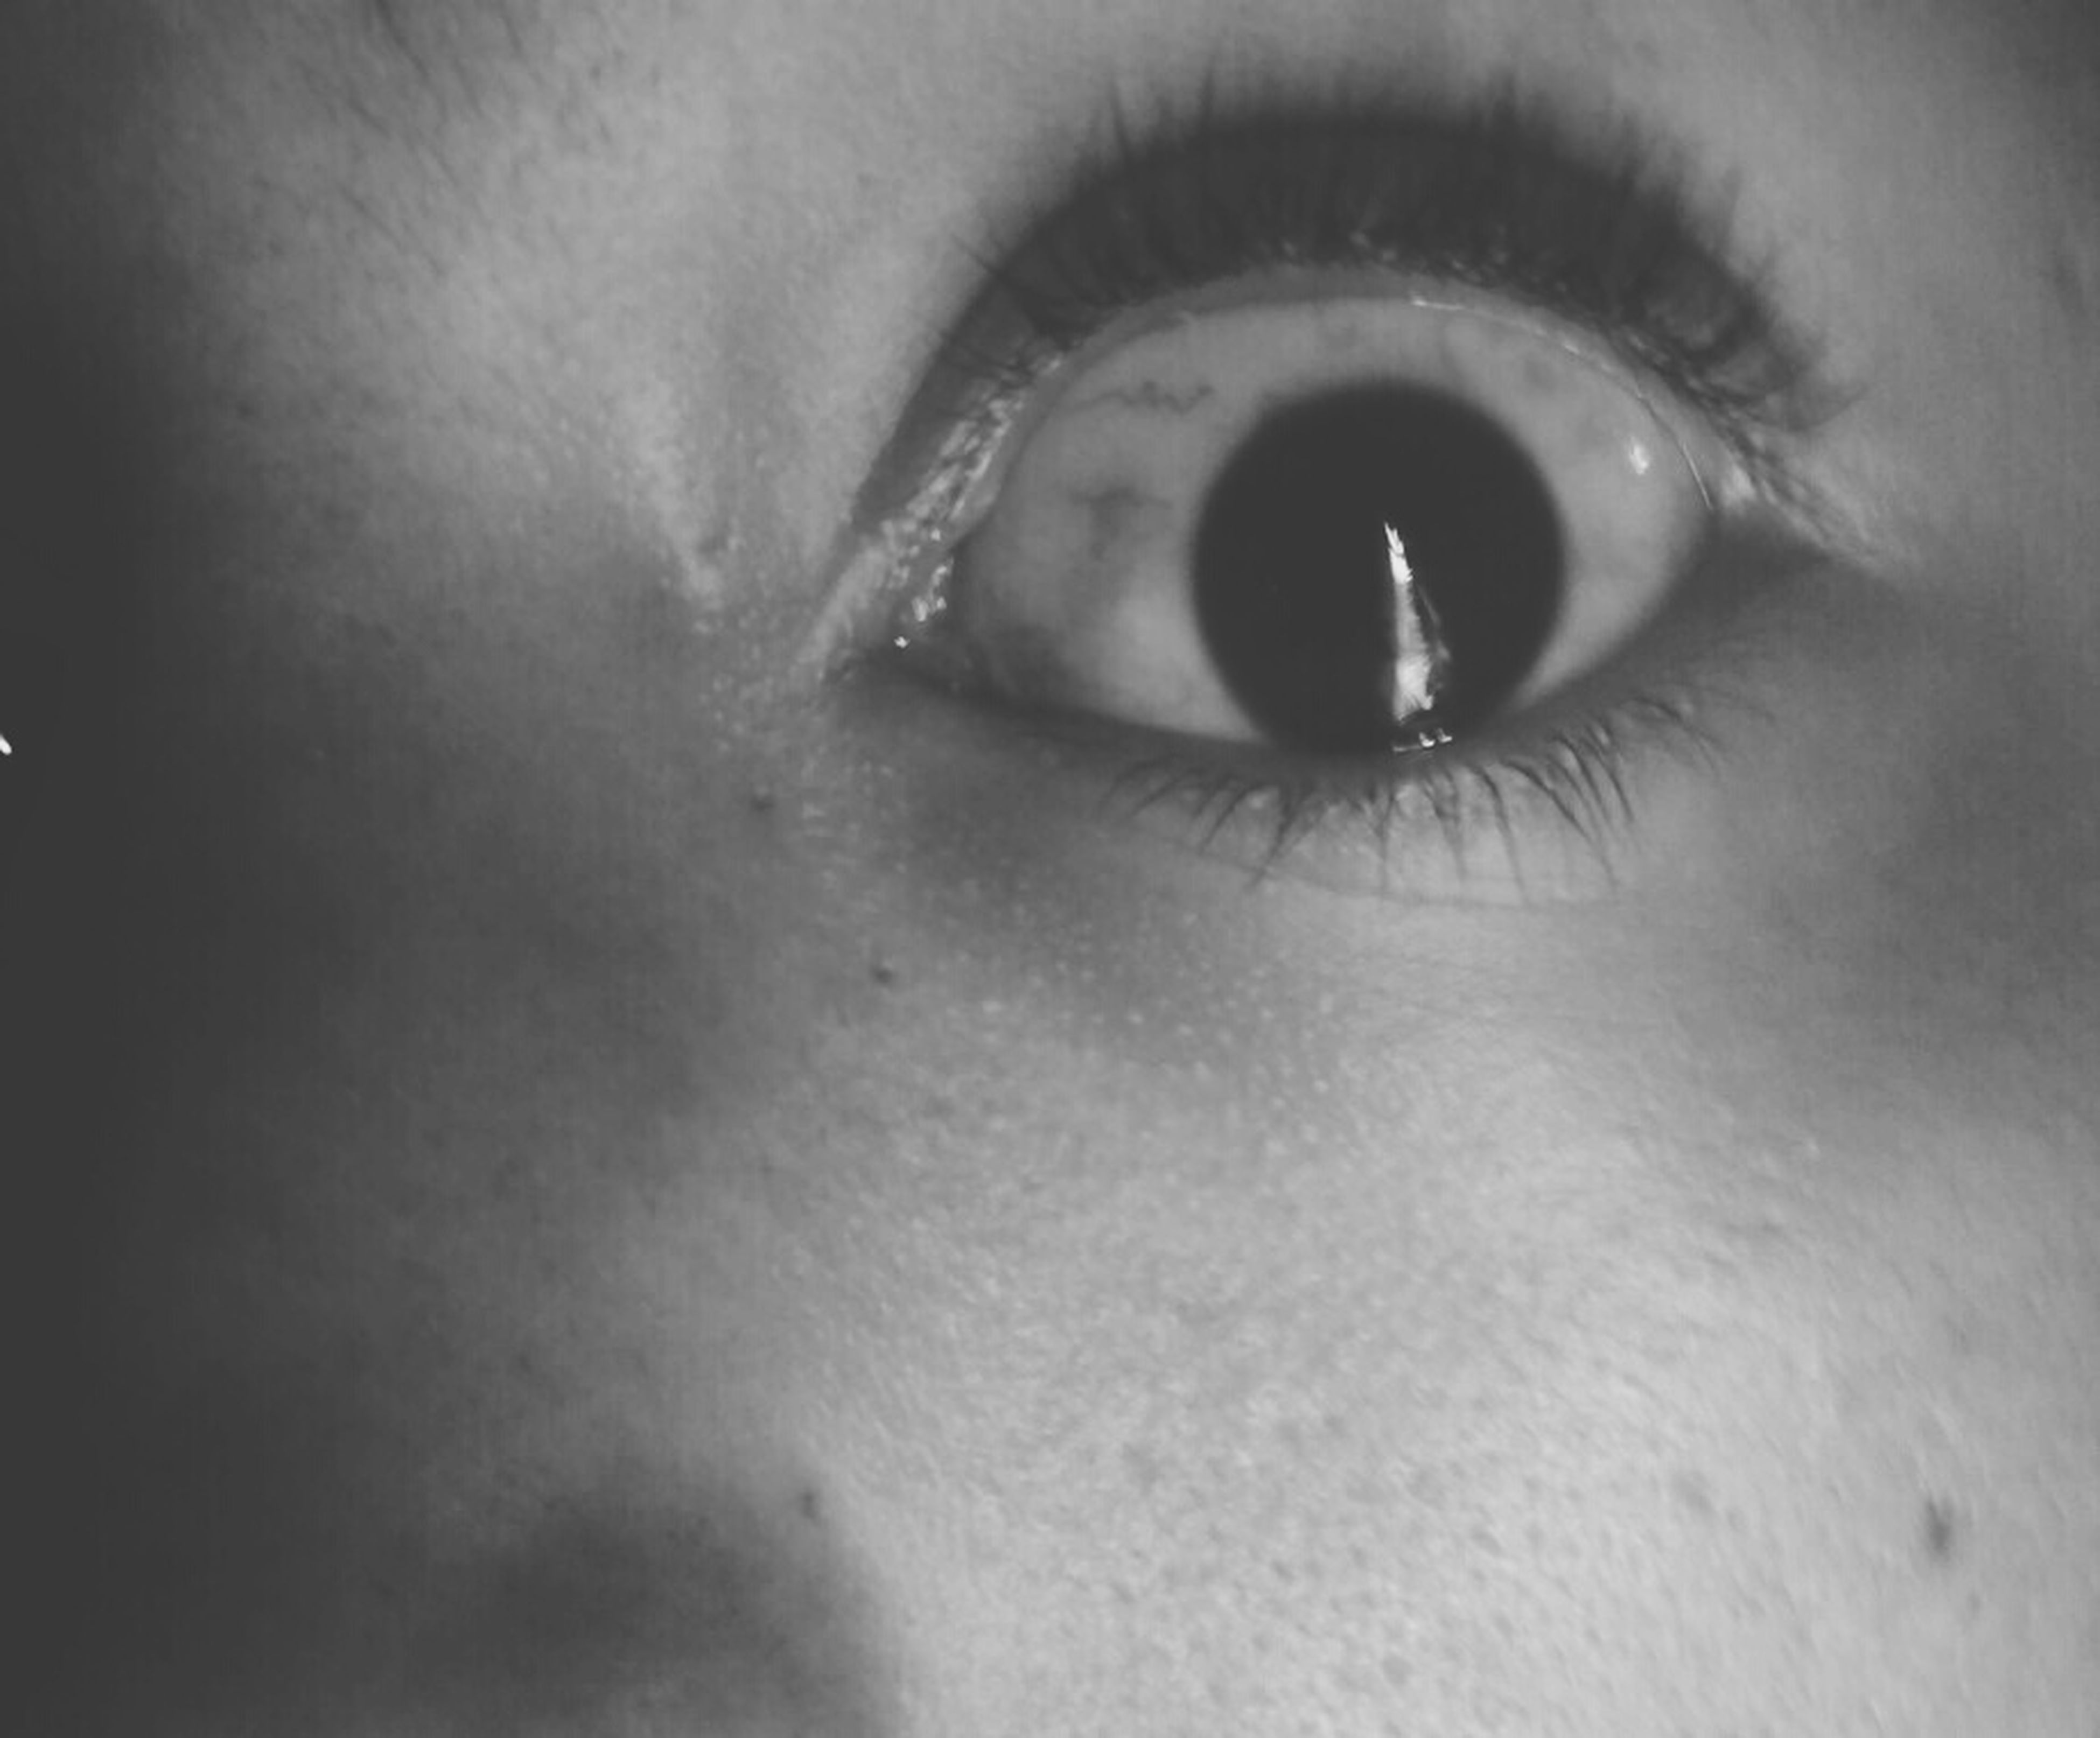 indoors, human eye, close-up, human face, human skin, eyelash, lifestyles, looking at camera, portrait, part of, eyesight, headshot, extreme close-up, young adult, sensory perception, front view, person